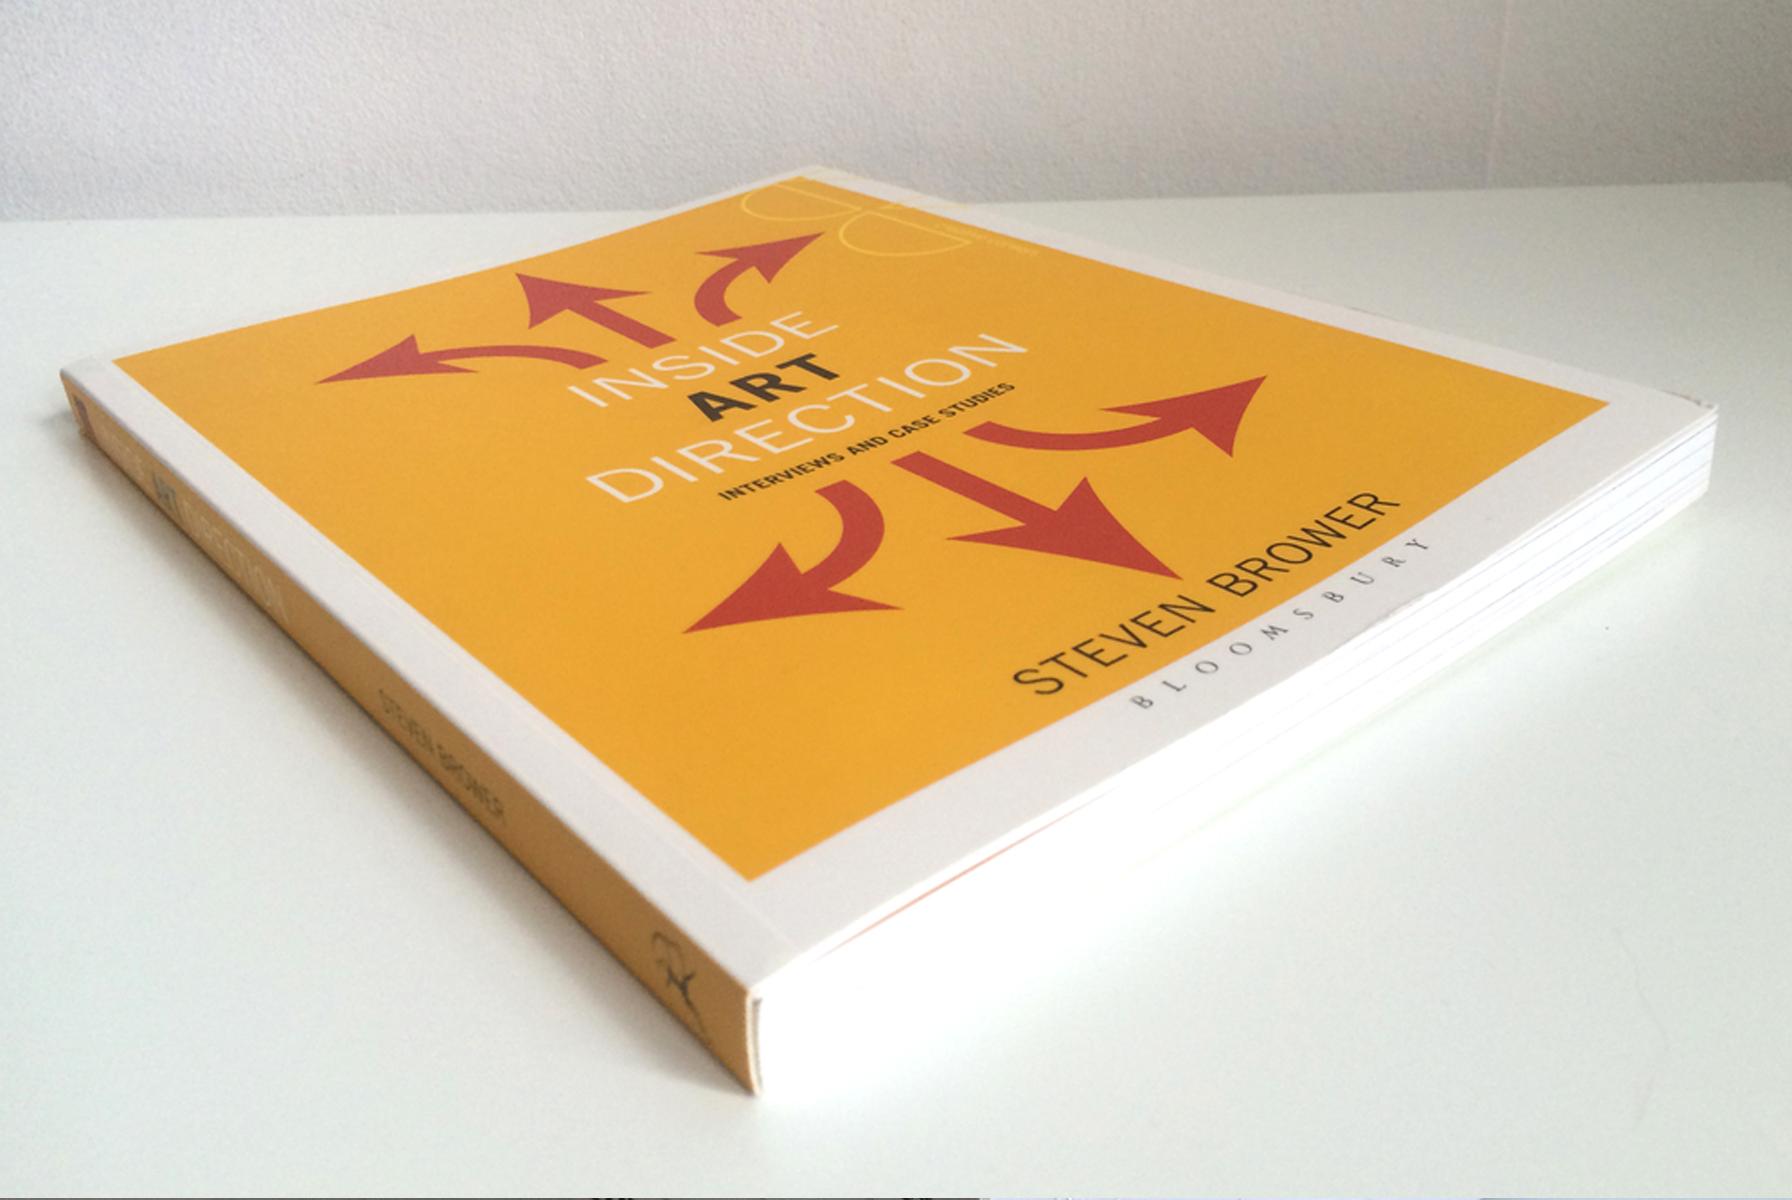 Inside Art Direction   Author: Steven Brower Paperback: 232 pages Publisher: Fairchild Books (2016)    2016 INDIES Finalist